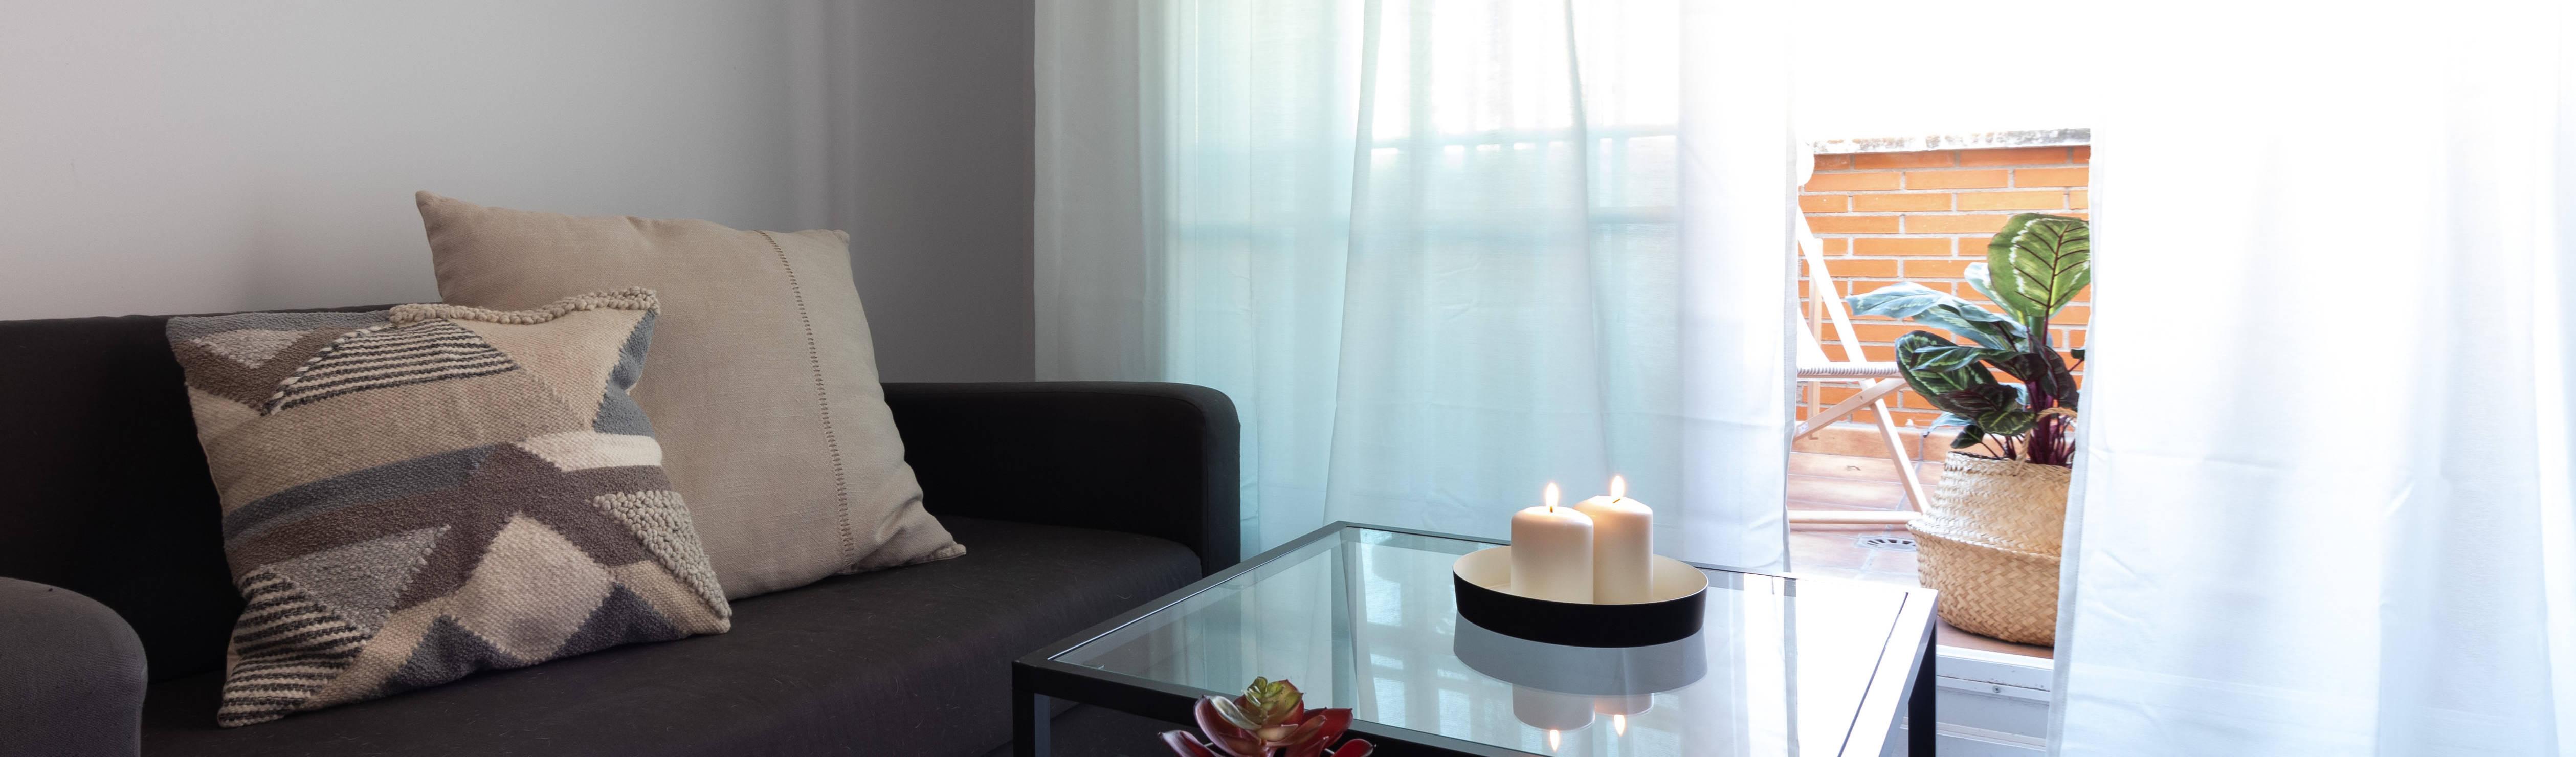 POMO. Home Staging & Design Studio